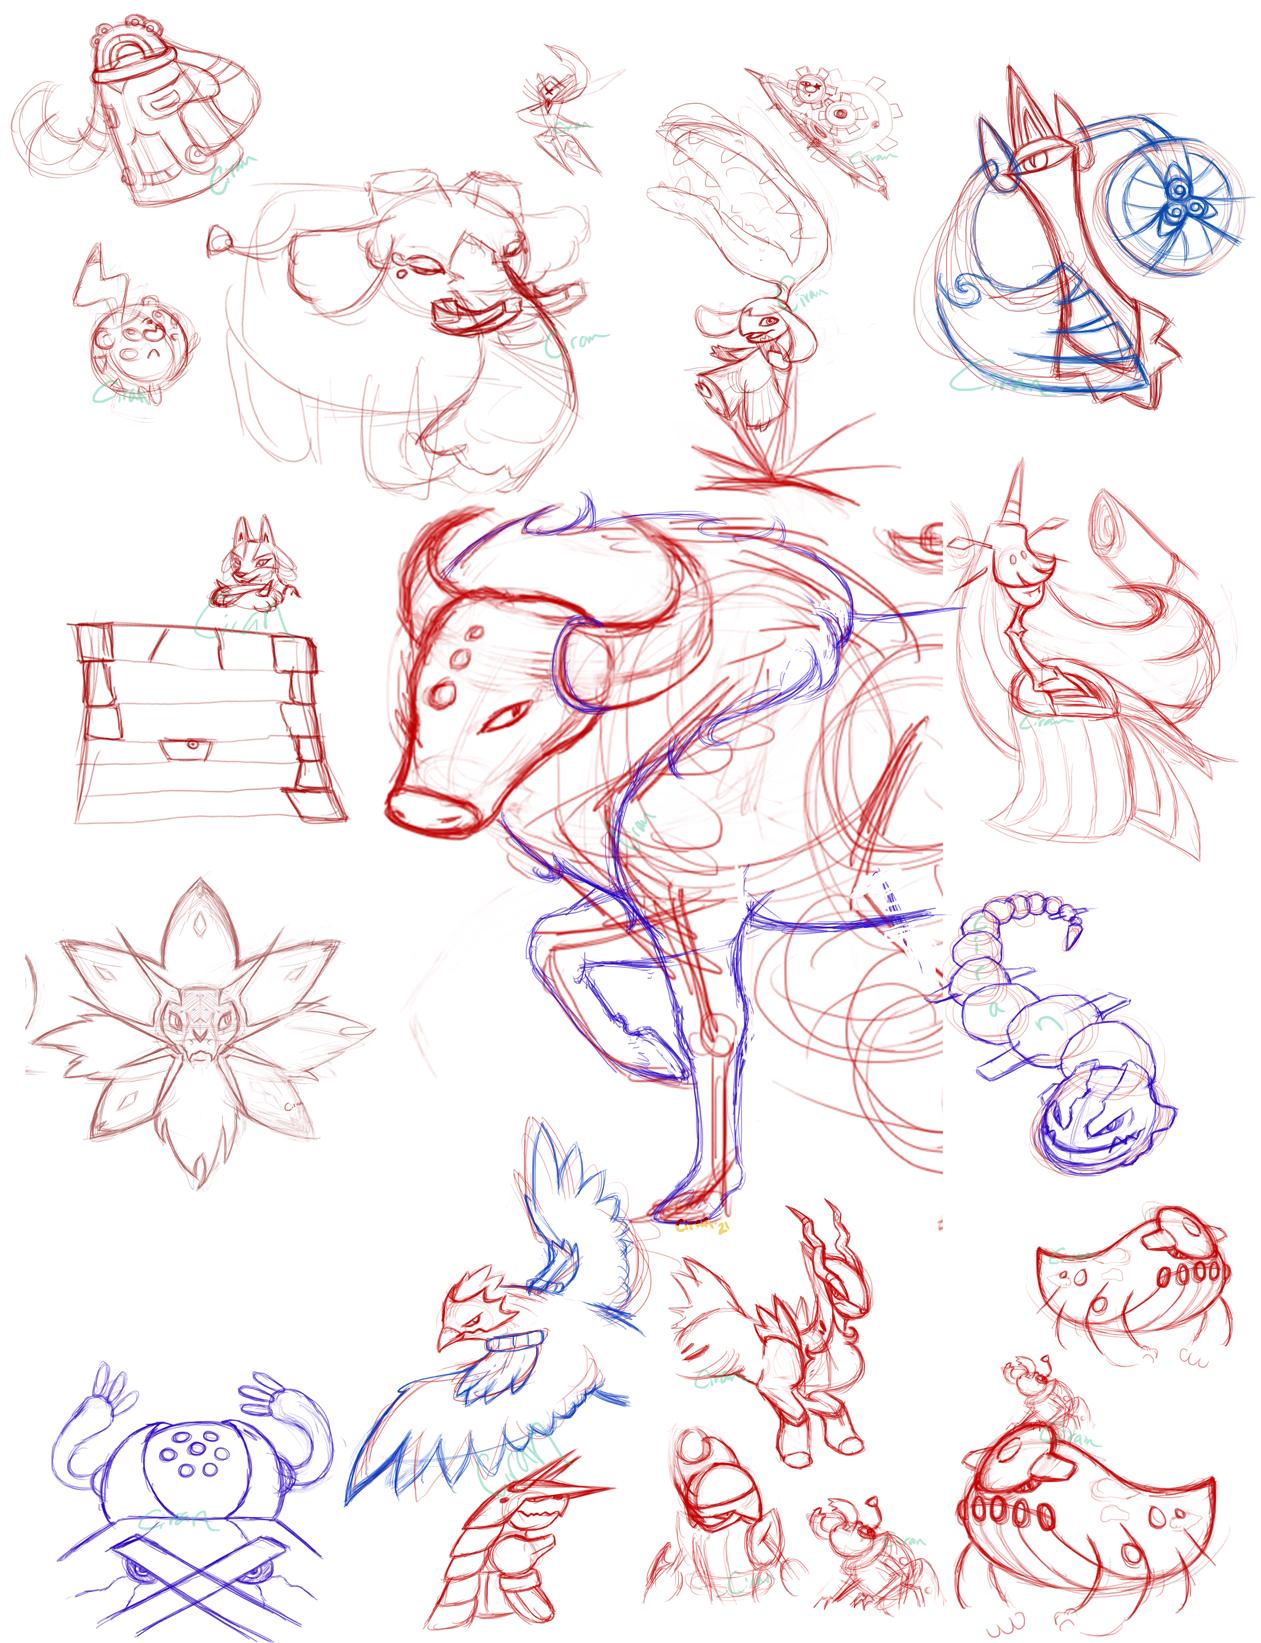 YotOx_sketches.png